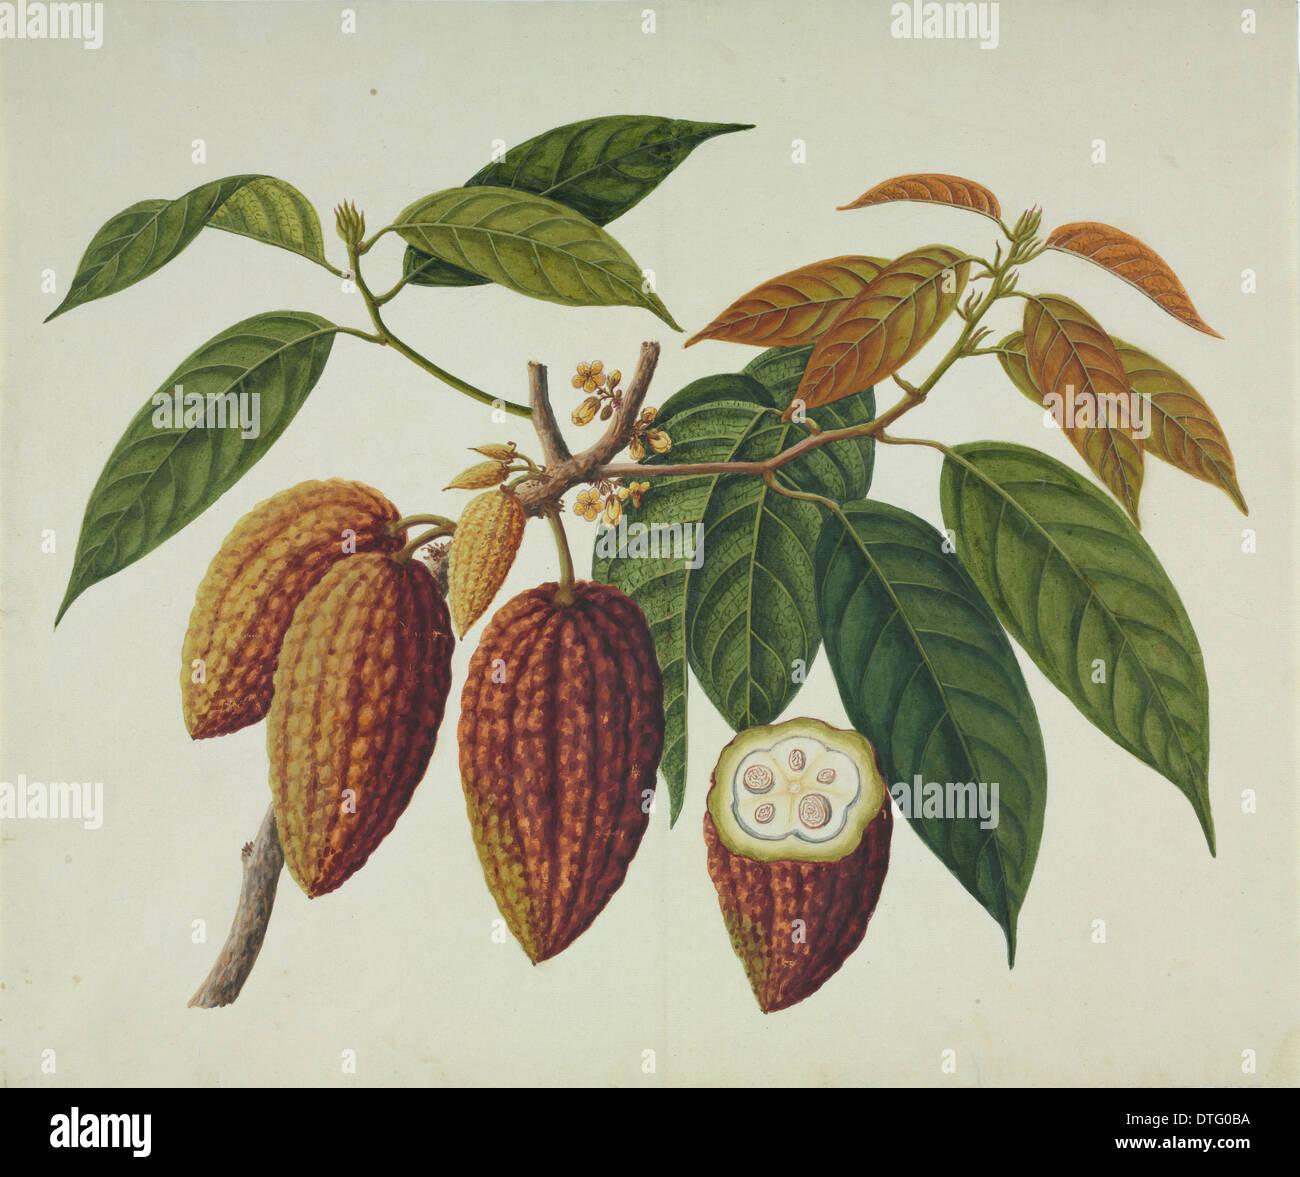 Theobroma cacao, cocoa plant Stock Photo